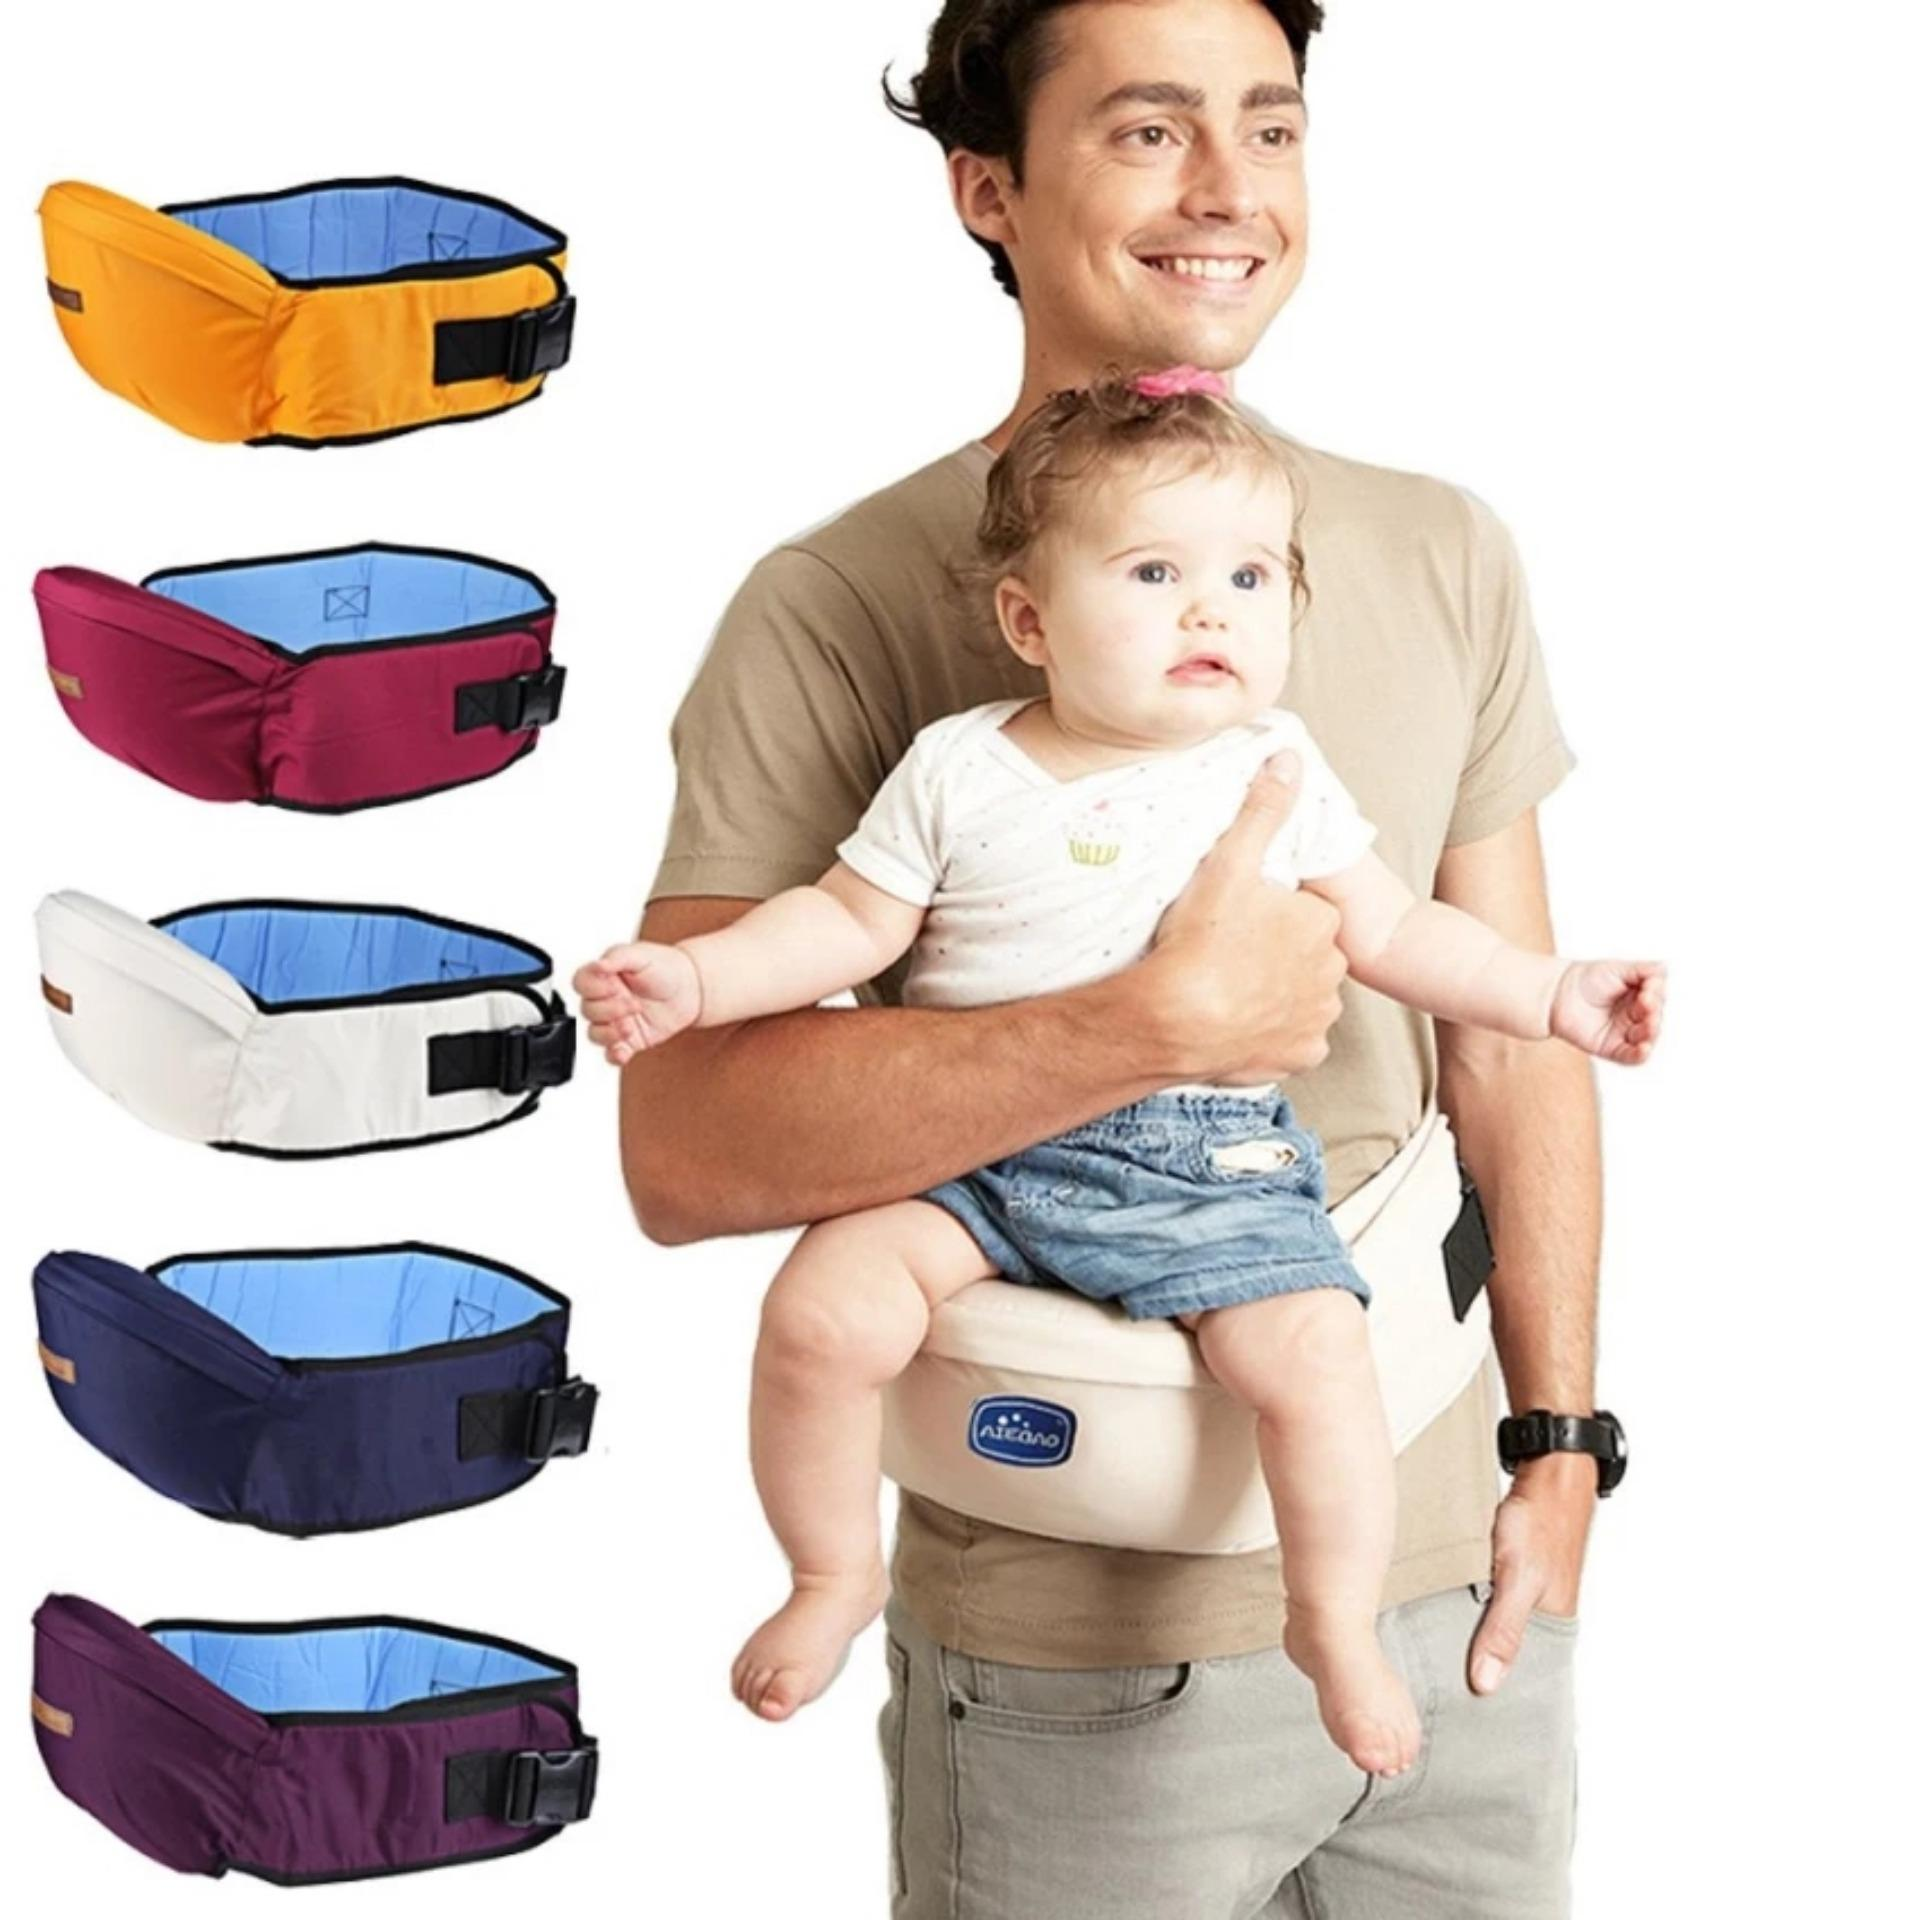 Marvogo Baby Carrier Waist Stool Walkers Baby Sling Hold Waist Belt Backpack Hipseat Belt Kids Infant Hip Seat-Purple - intl